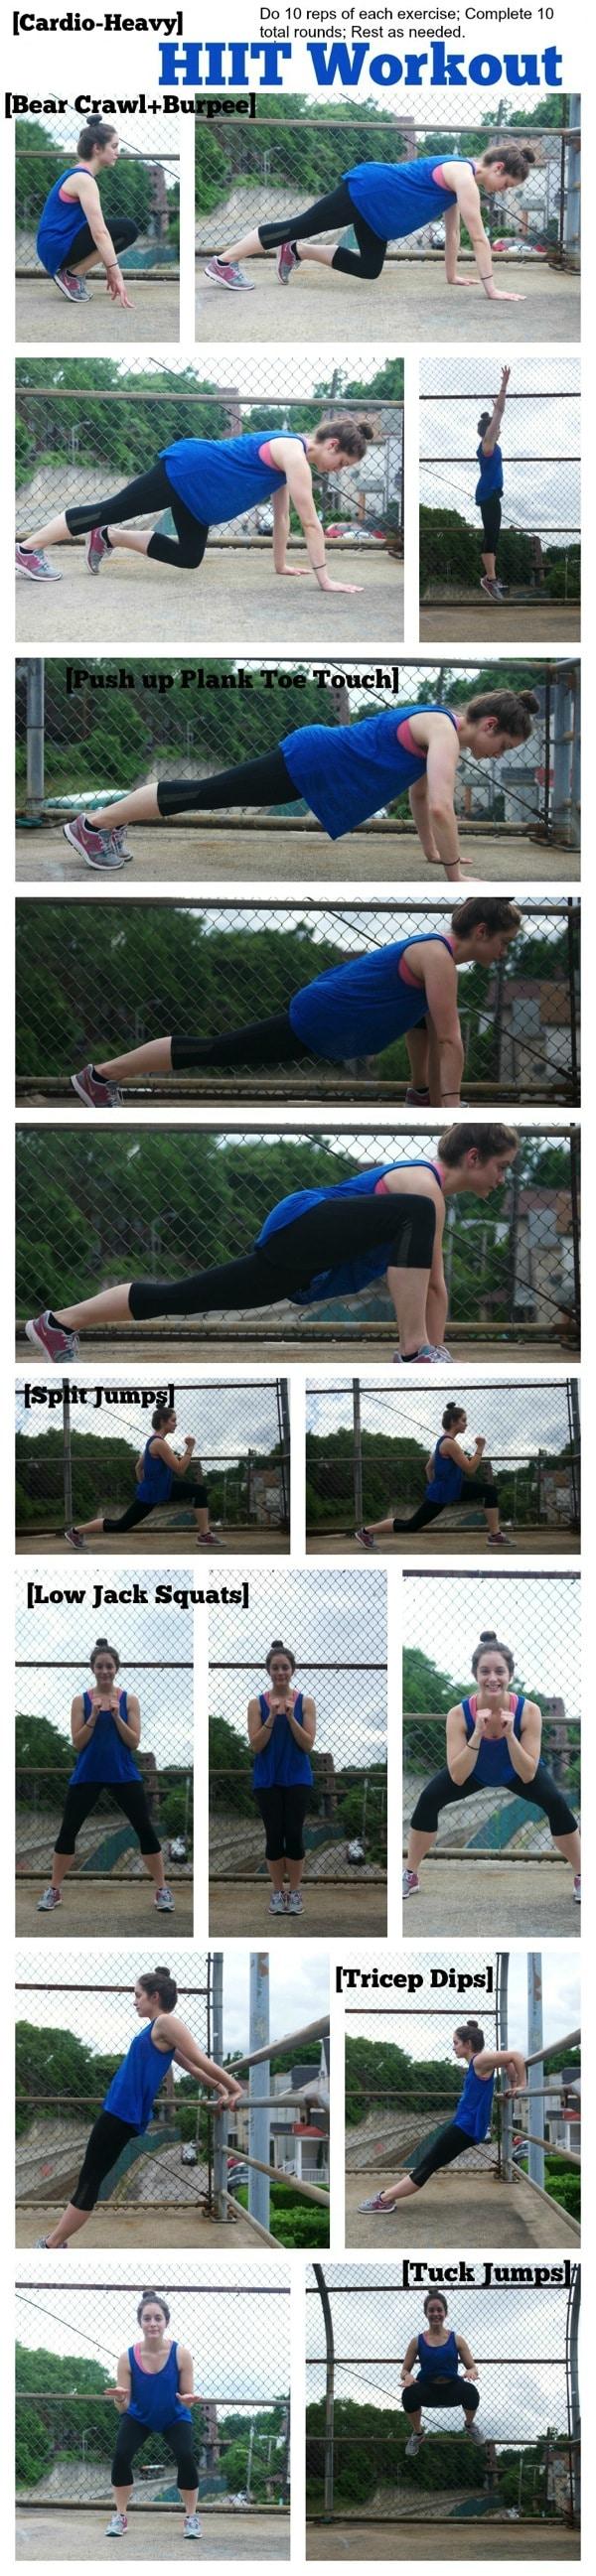 Cardio-Heavy HIIT Workout